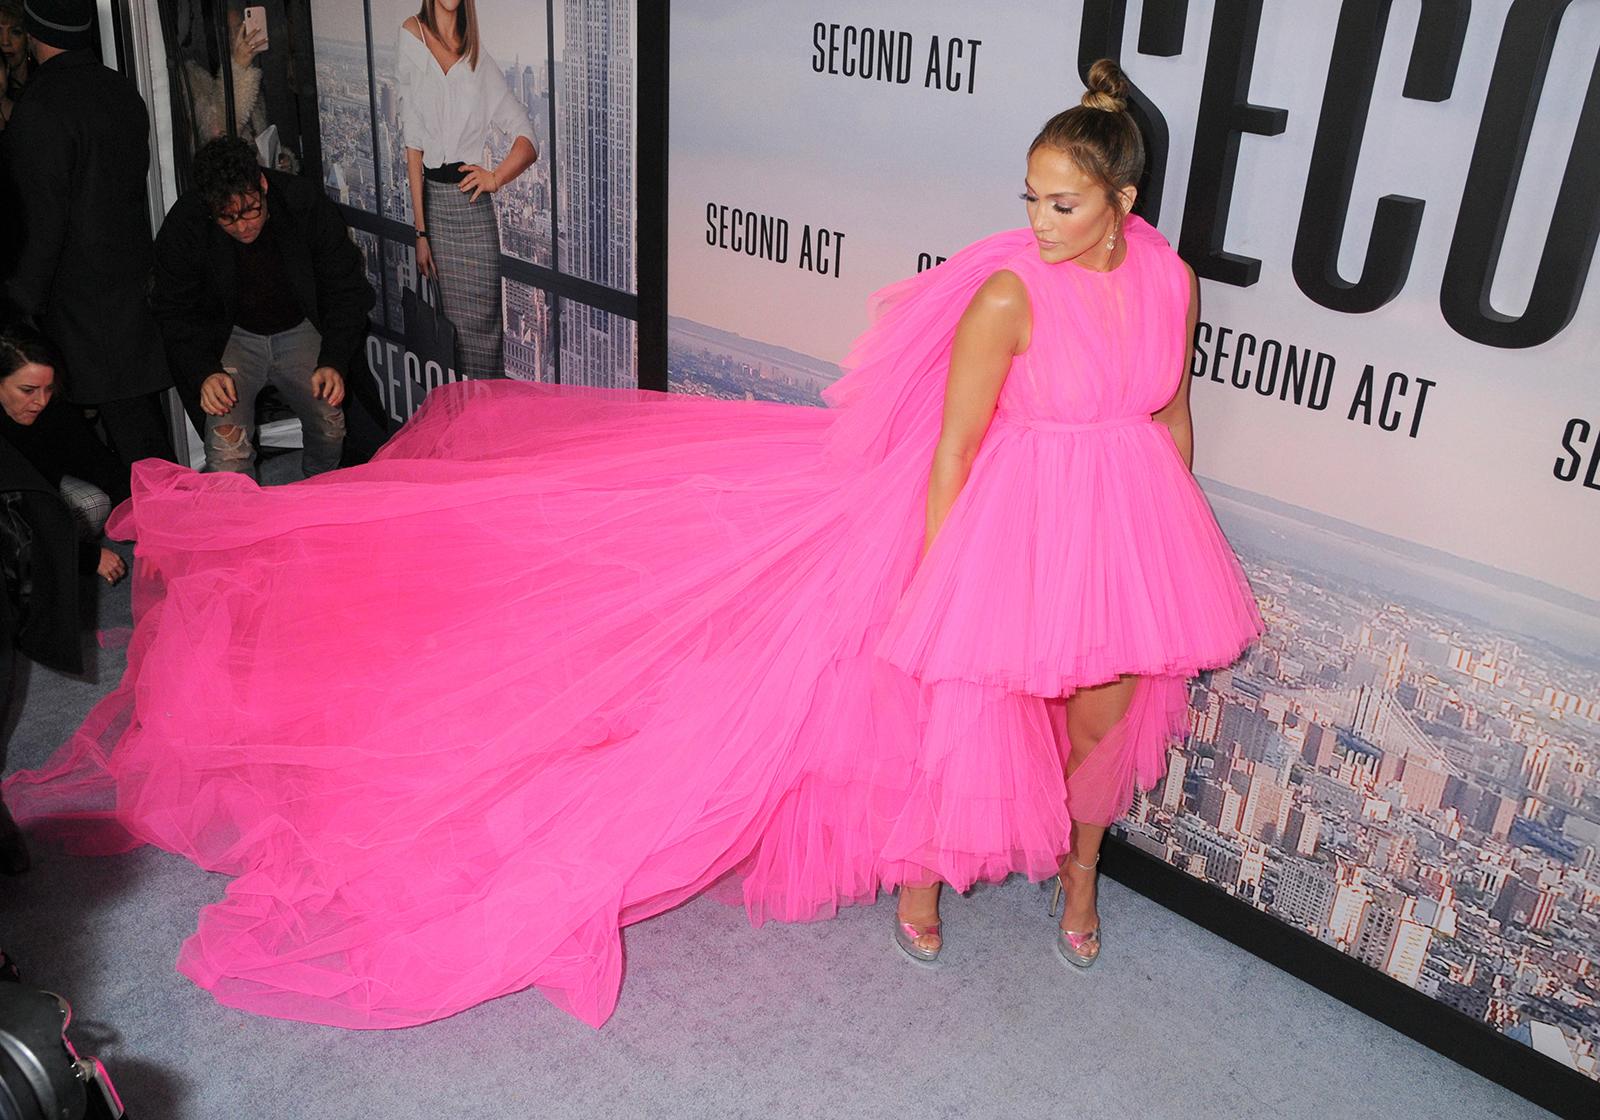 Pink Poofy Dress